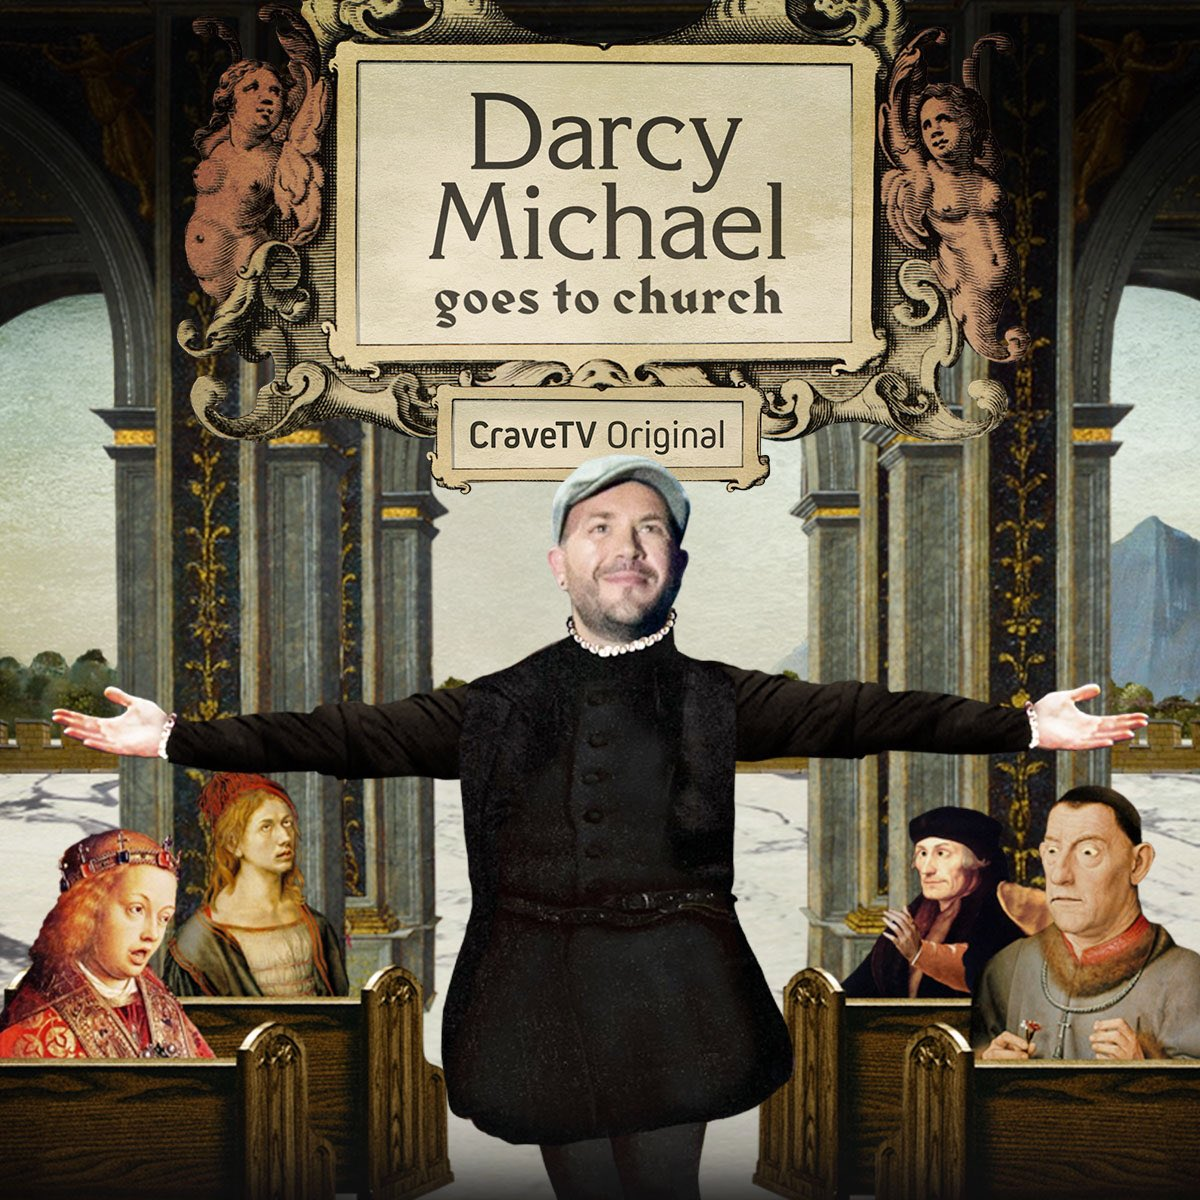 Darcy Michael